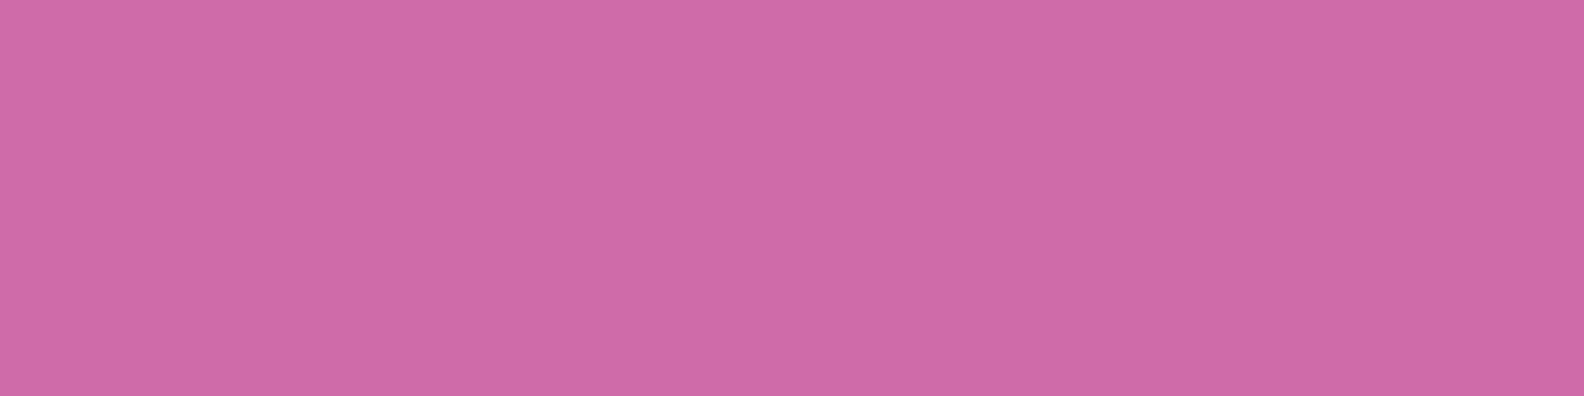 1584x396 Super Pink Solid Color Background